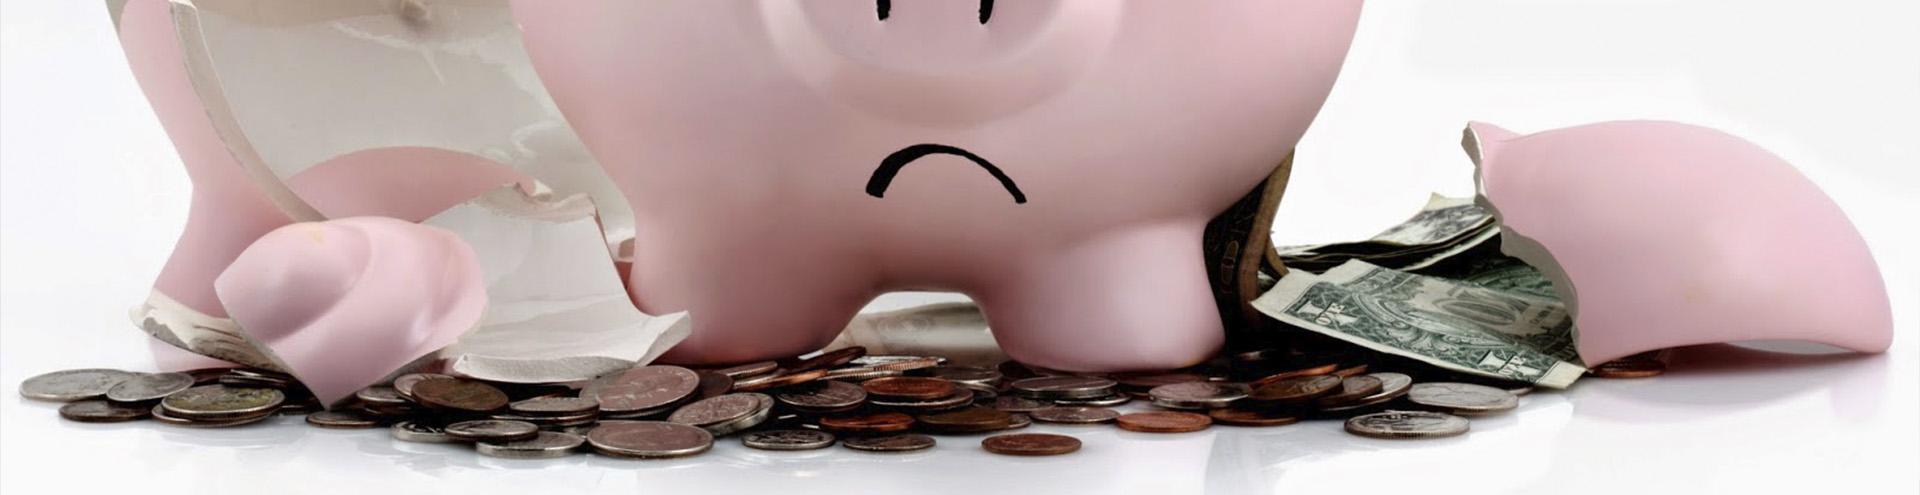 банкротство банка в Калуге